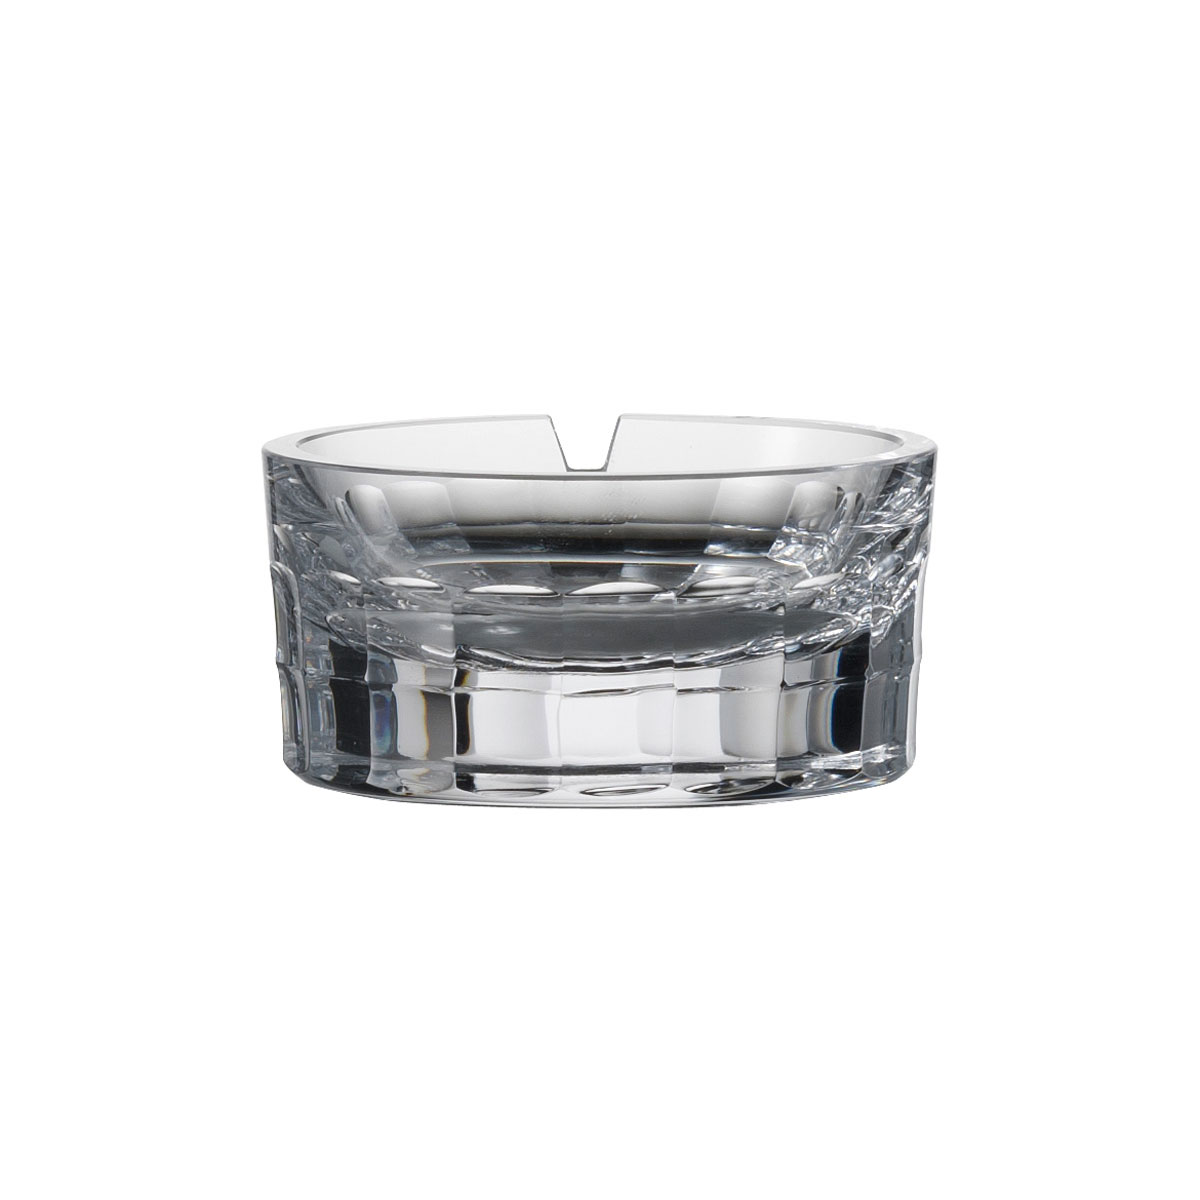 Schott Zwiesel Tritan Crystal, 1872 Charles Schumann Hommage Carat Crystal Ashtray